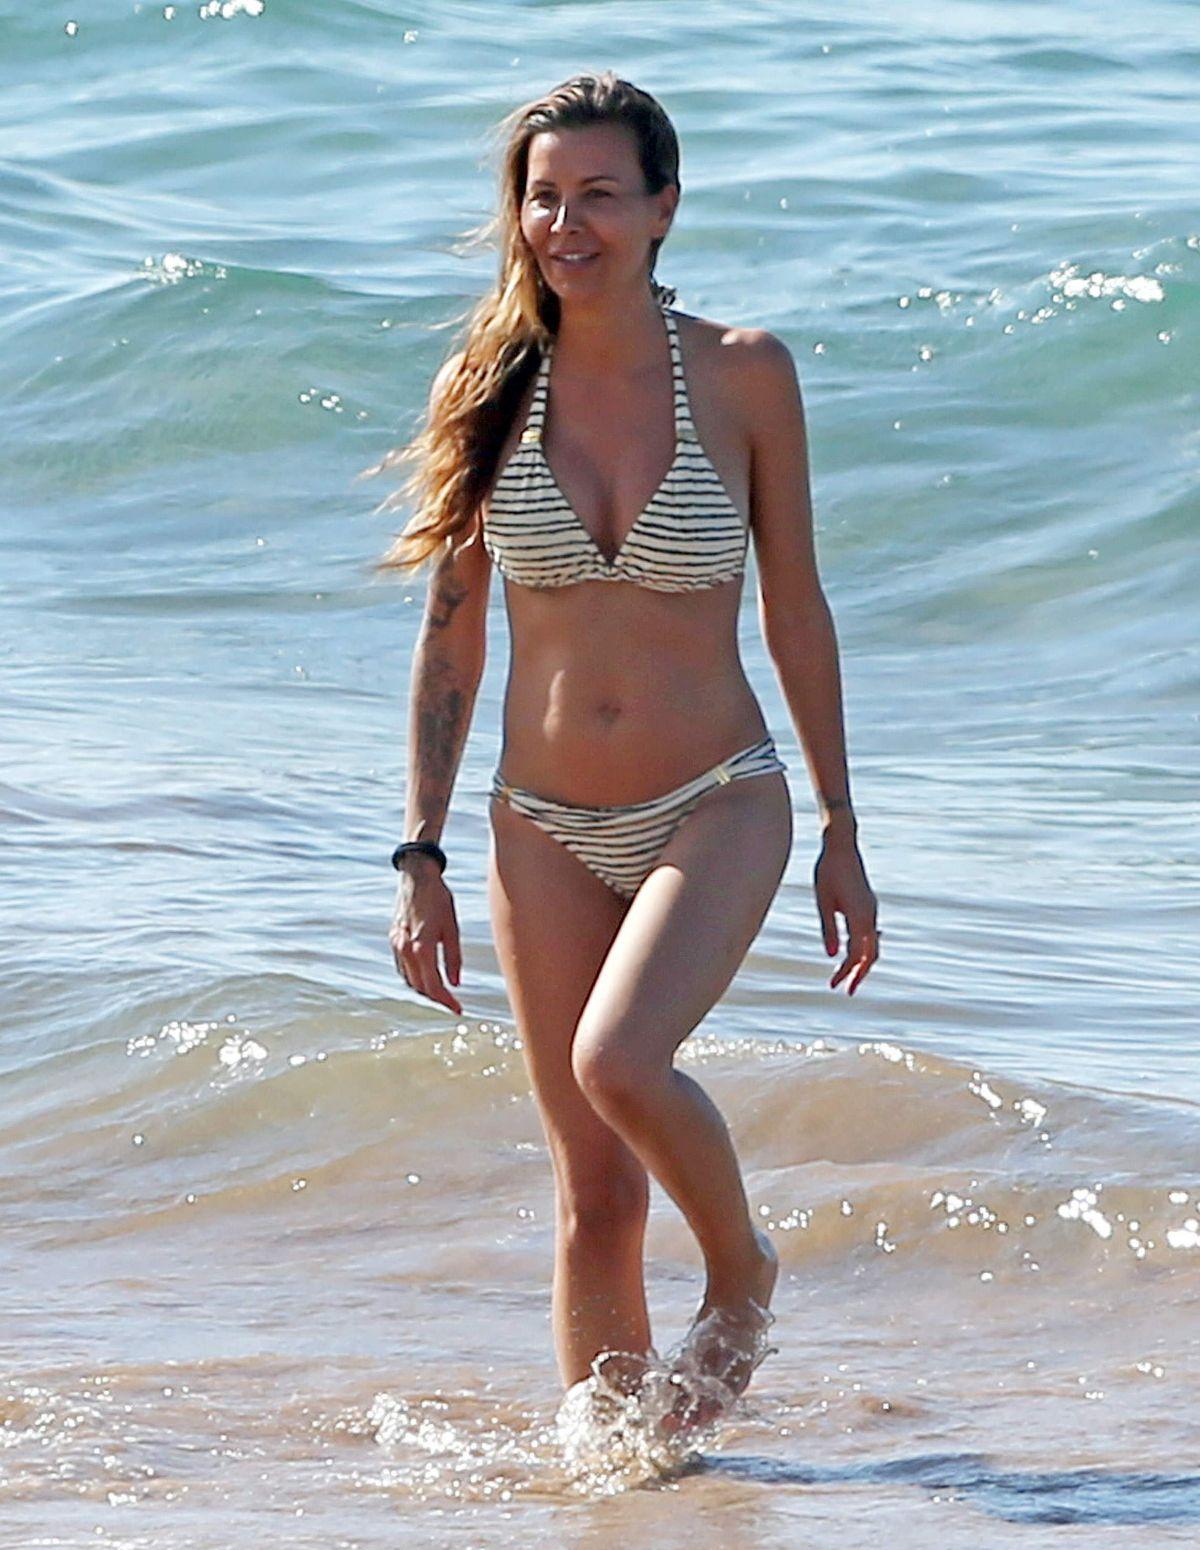 Discussion on this topic: Jessica sutta, january-jones-wearing-a-bikini/